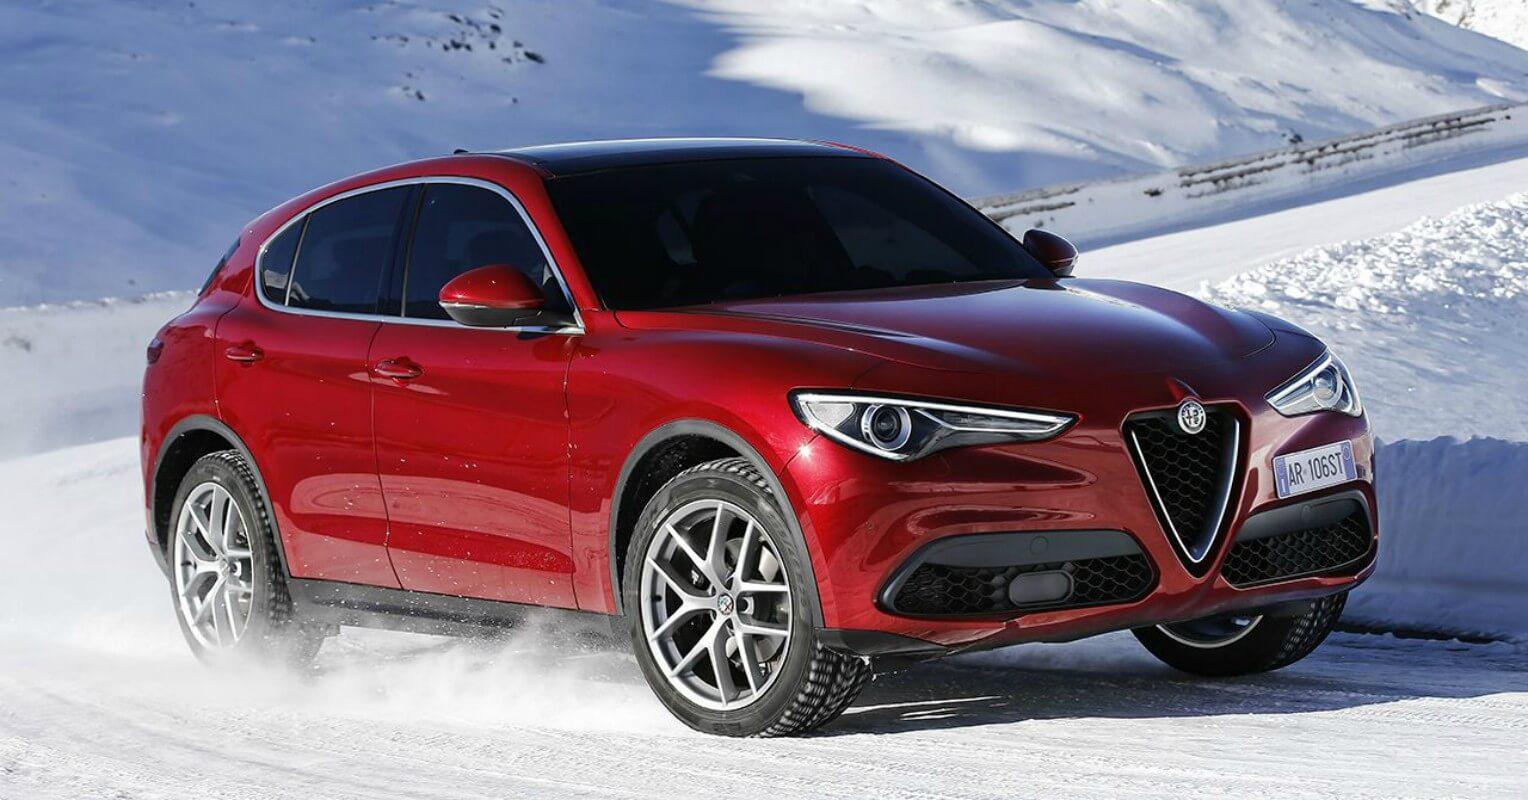 Alfa Romeo Stelvio finalista coche del año en Europa 2018